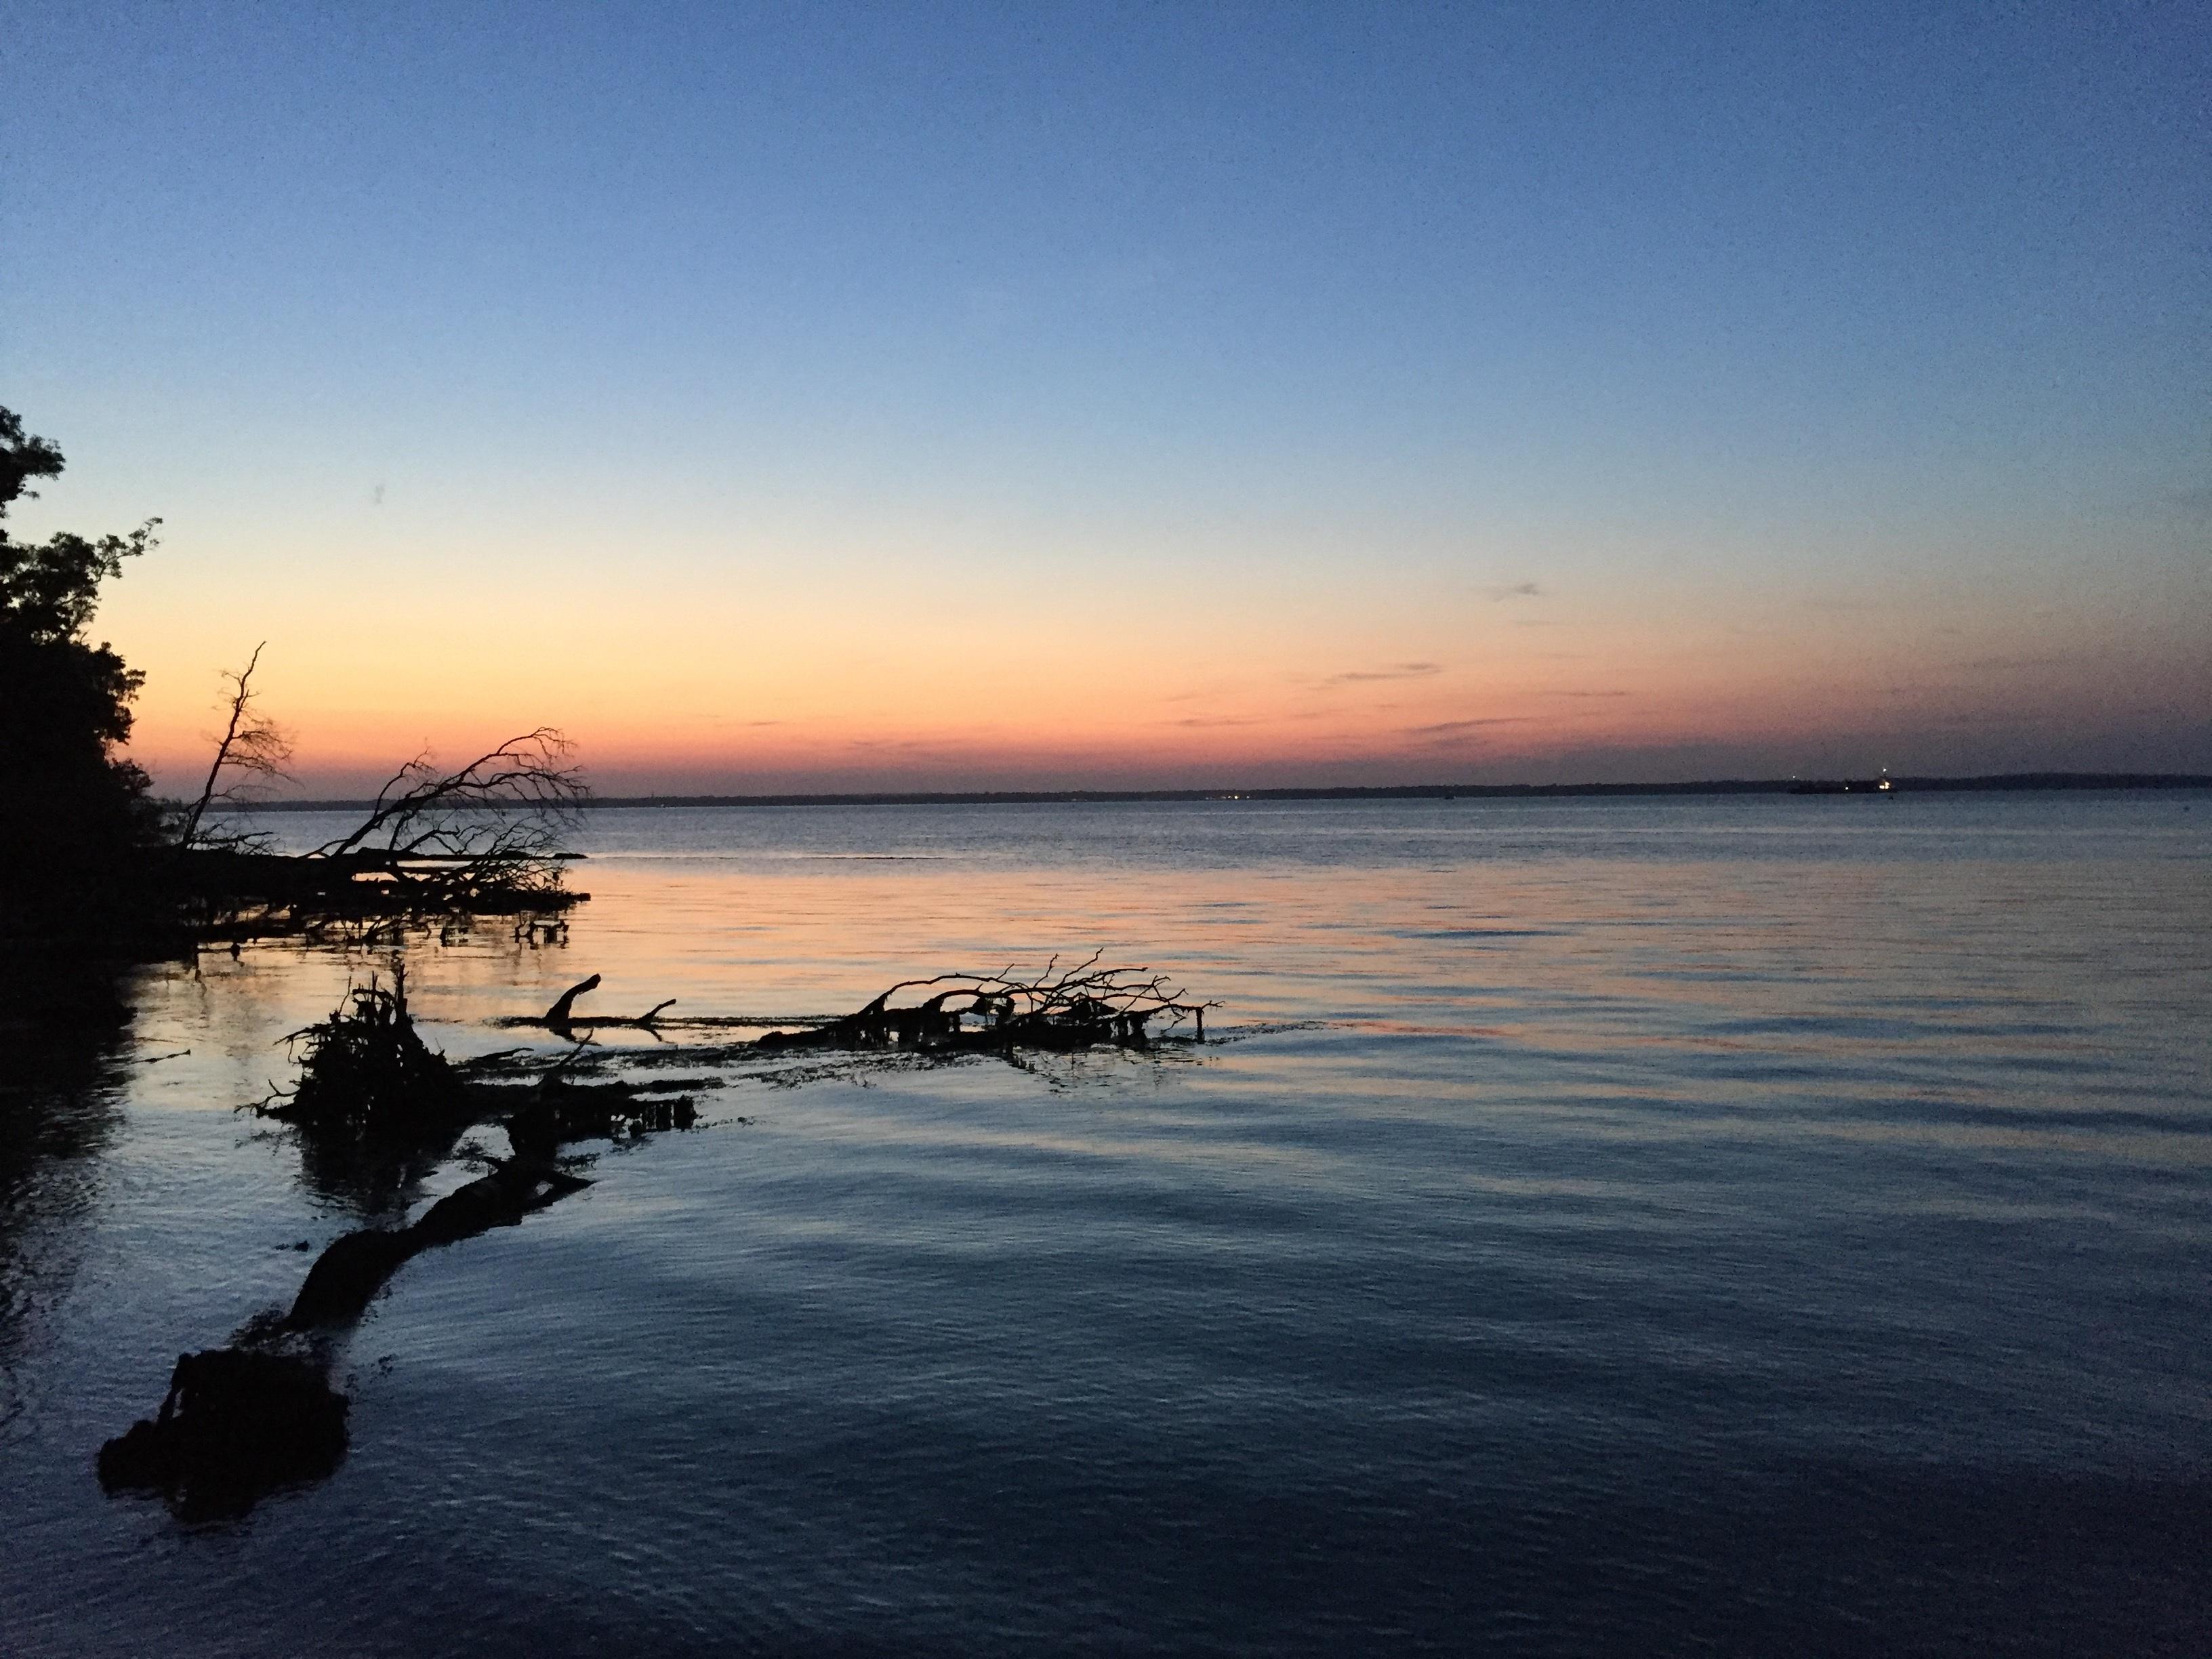 Gambar Pemandangan Laut Senja Tenang 3264x2448 1372039